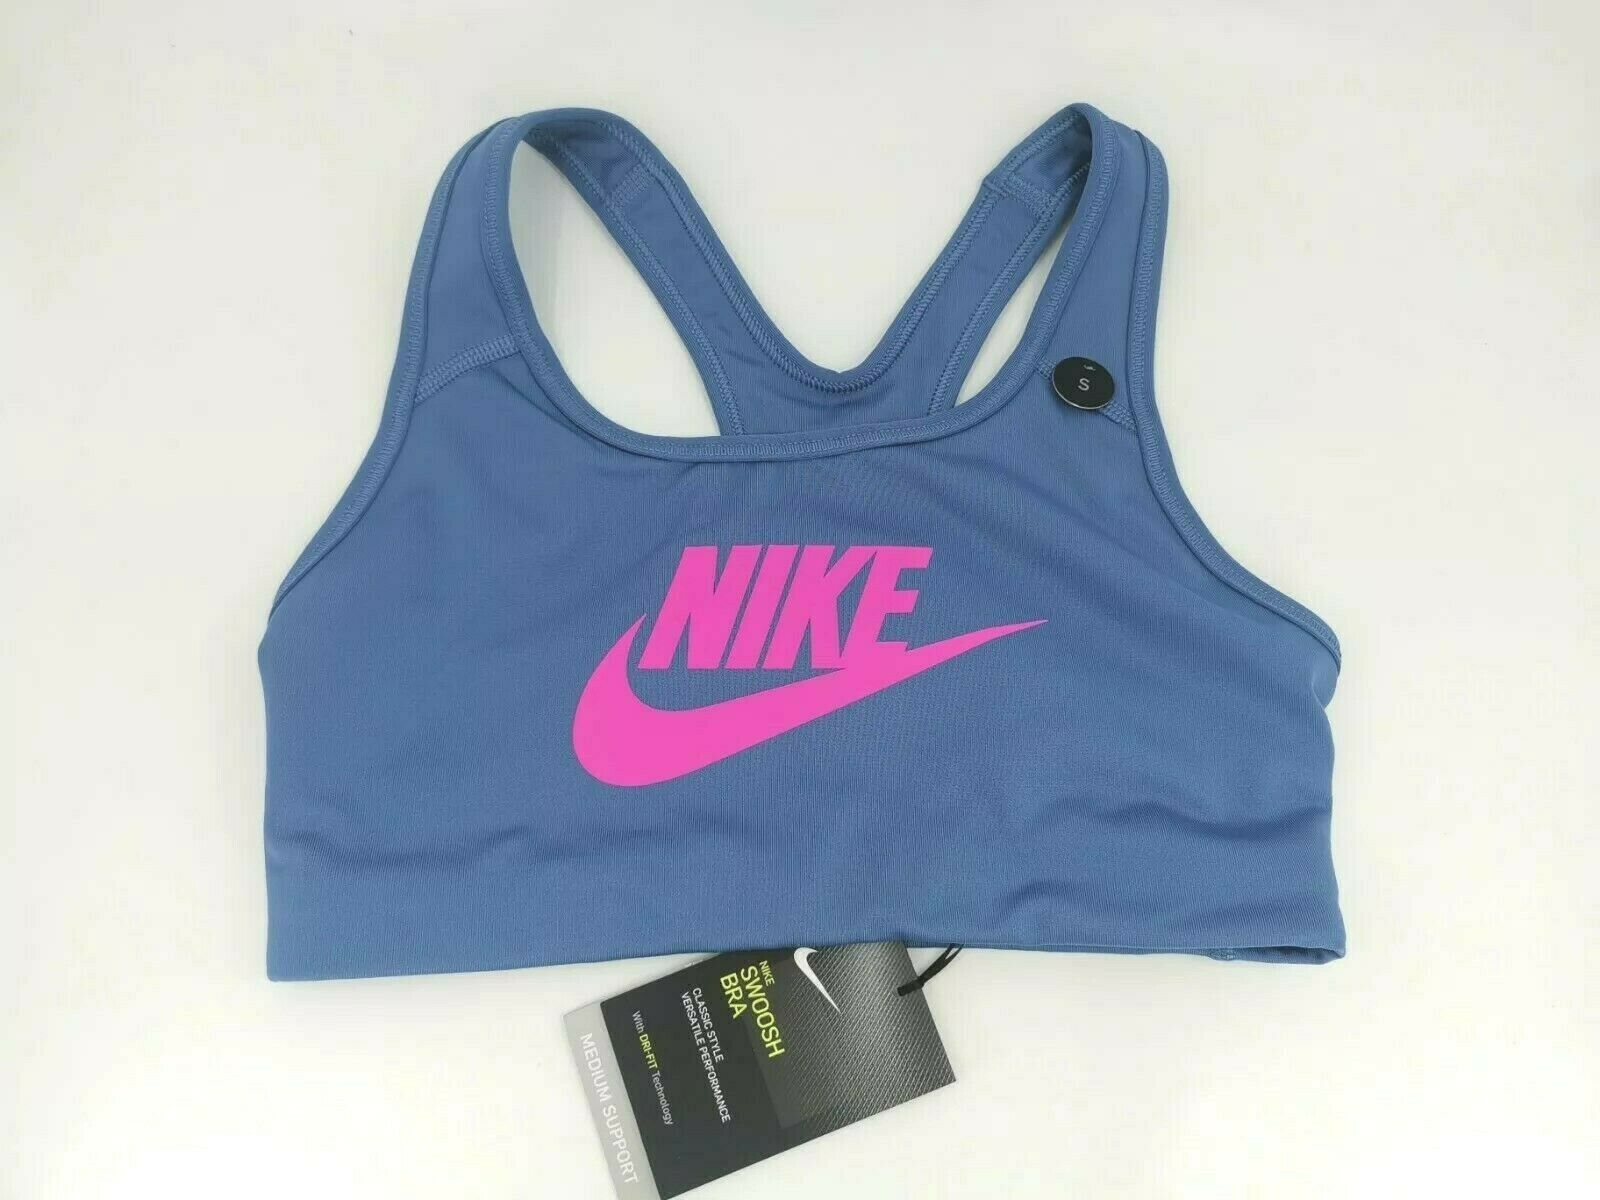 Nike Swoosh Sports Bra Small S Indigo Storm Fuchia 899370-458 Medium Support